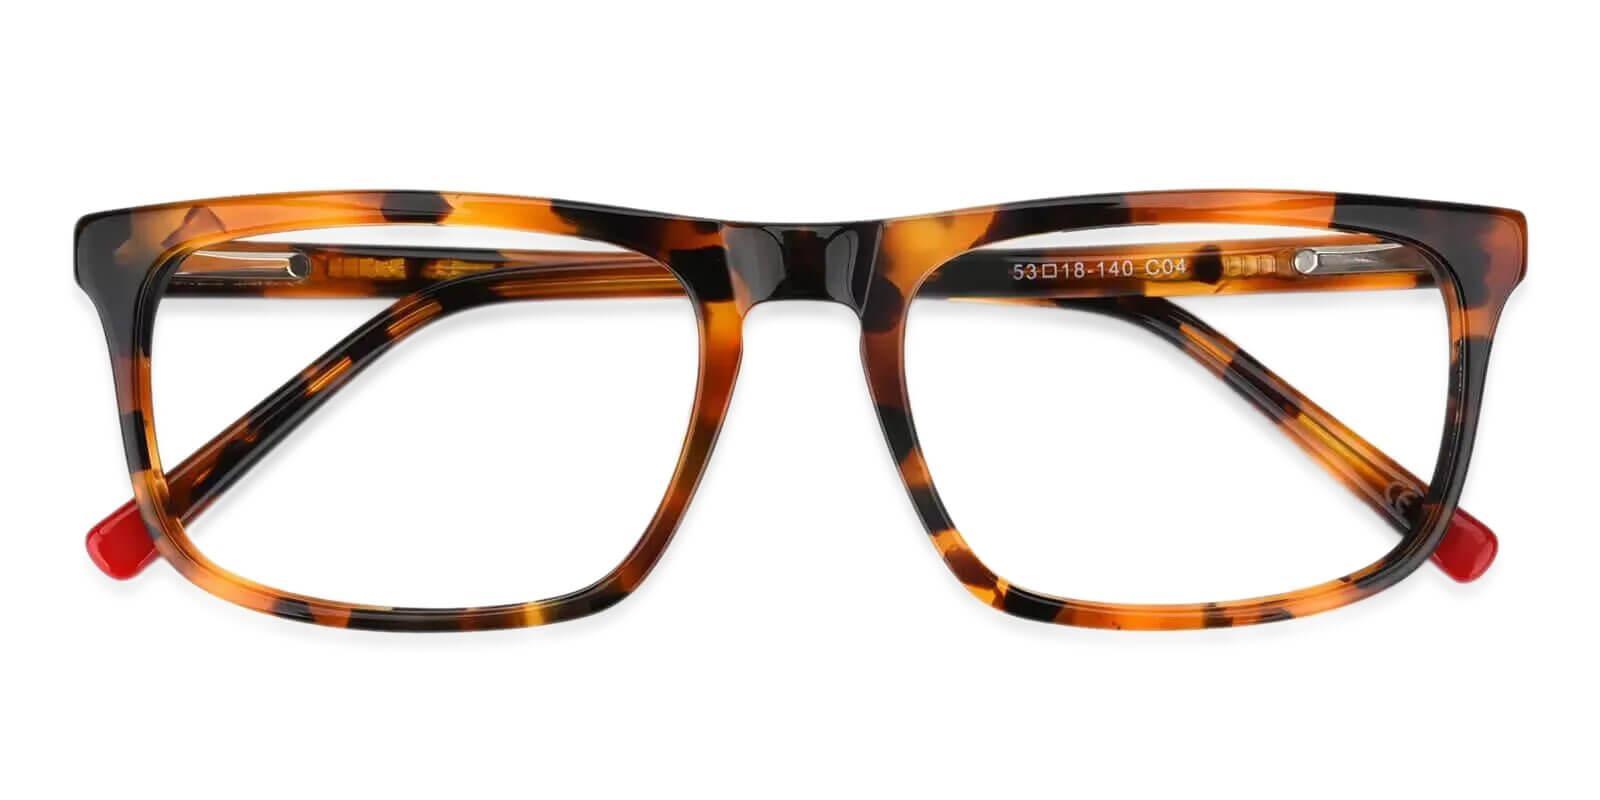 McIntosh Tortoise Acetate Eyeglasses , Lightweight , SpringHinges , UniversalBridgeFit Frames from ABBE Glasses